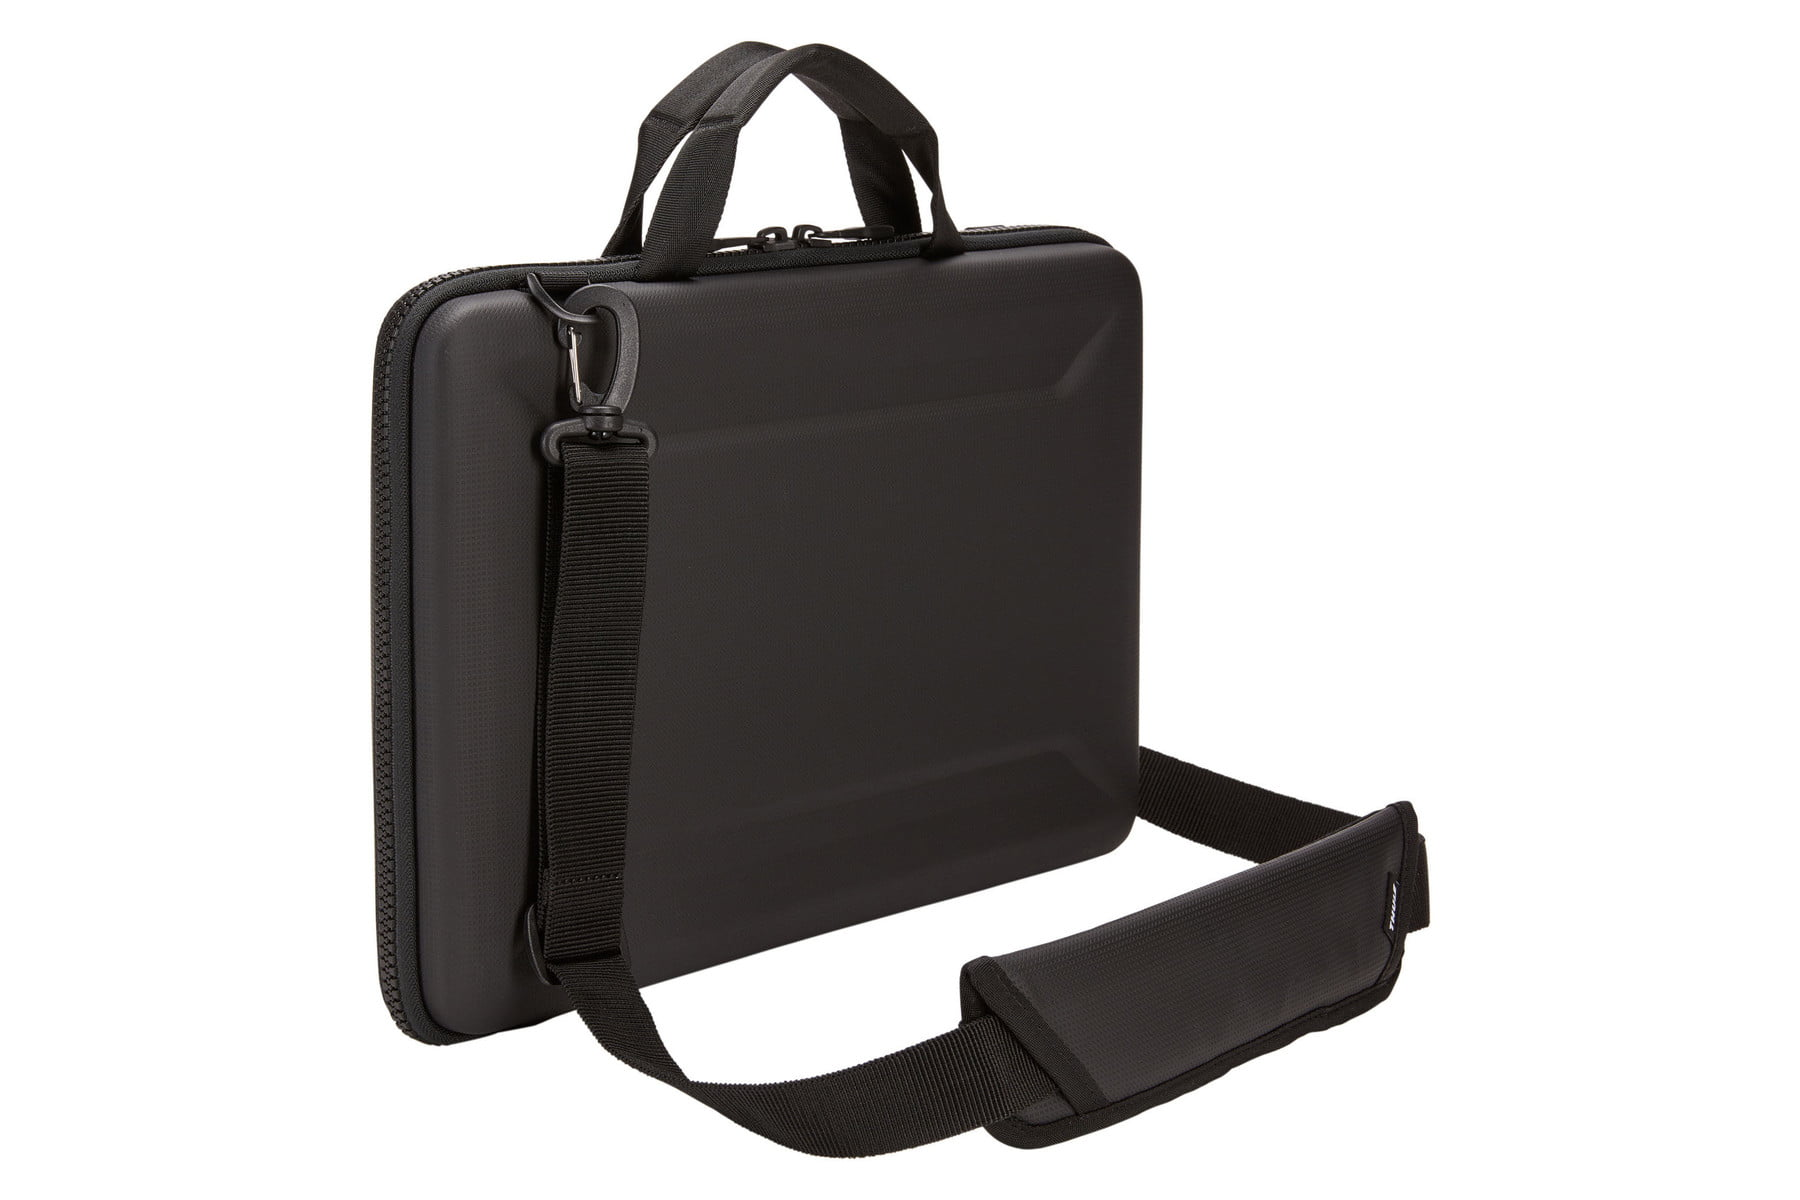 Geanta laptop Thule Gauntlet MacBook Pro 4.0 Attache 15 16 Black 3